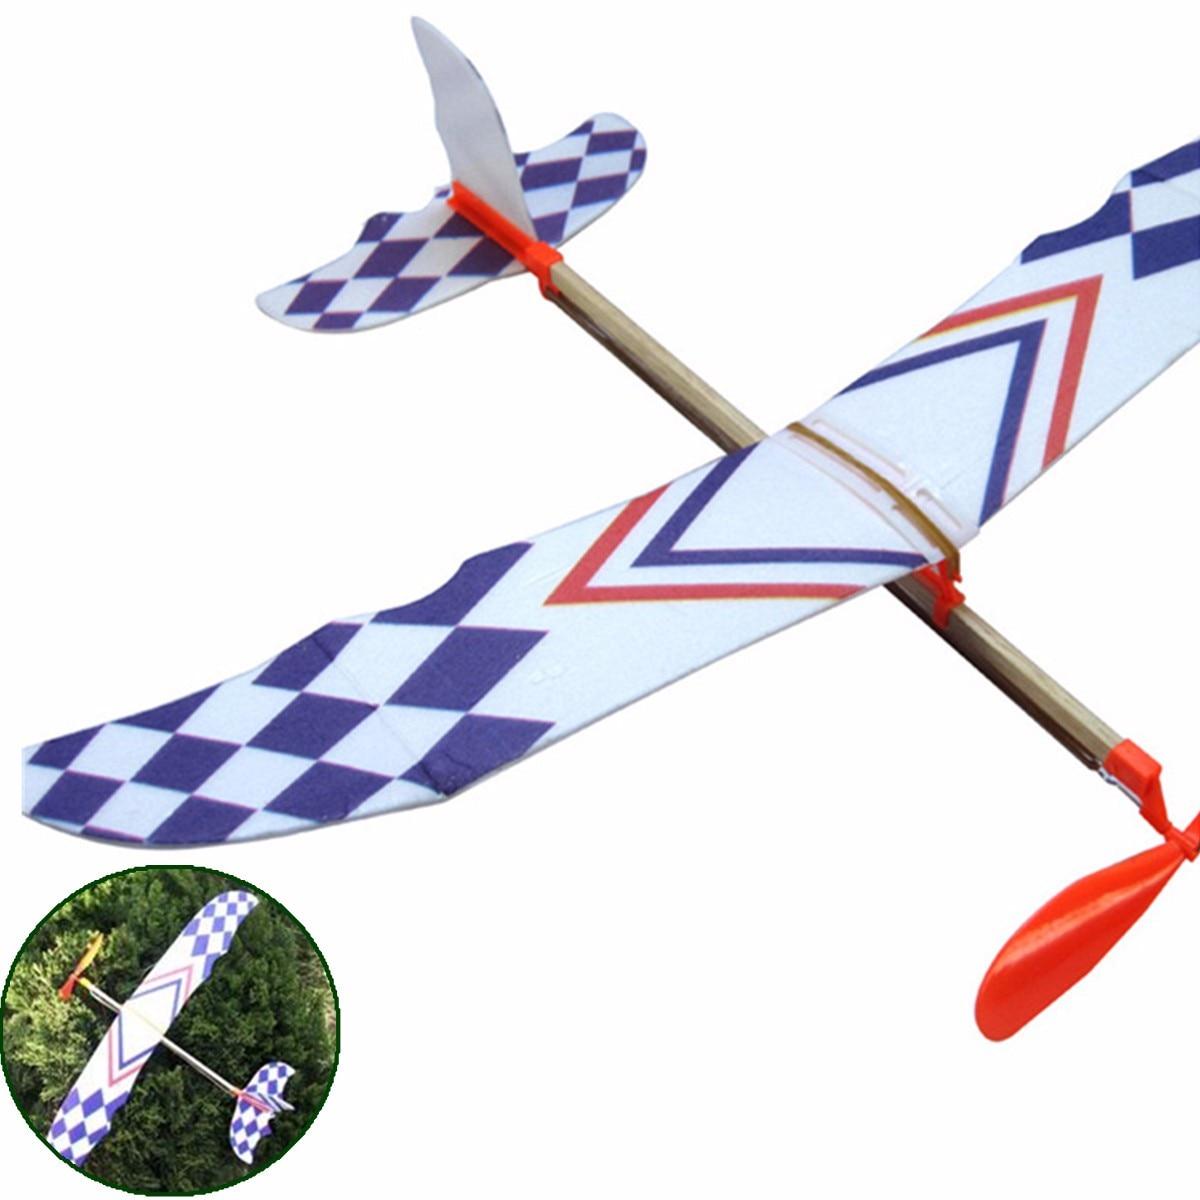 Toys & Hobbies Hot Diy Plastic Foam Elastic Rubber Powered Flying Plane Kit Aircraft Model Educational Toy Best Festival Gifts Children E